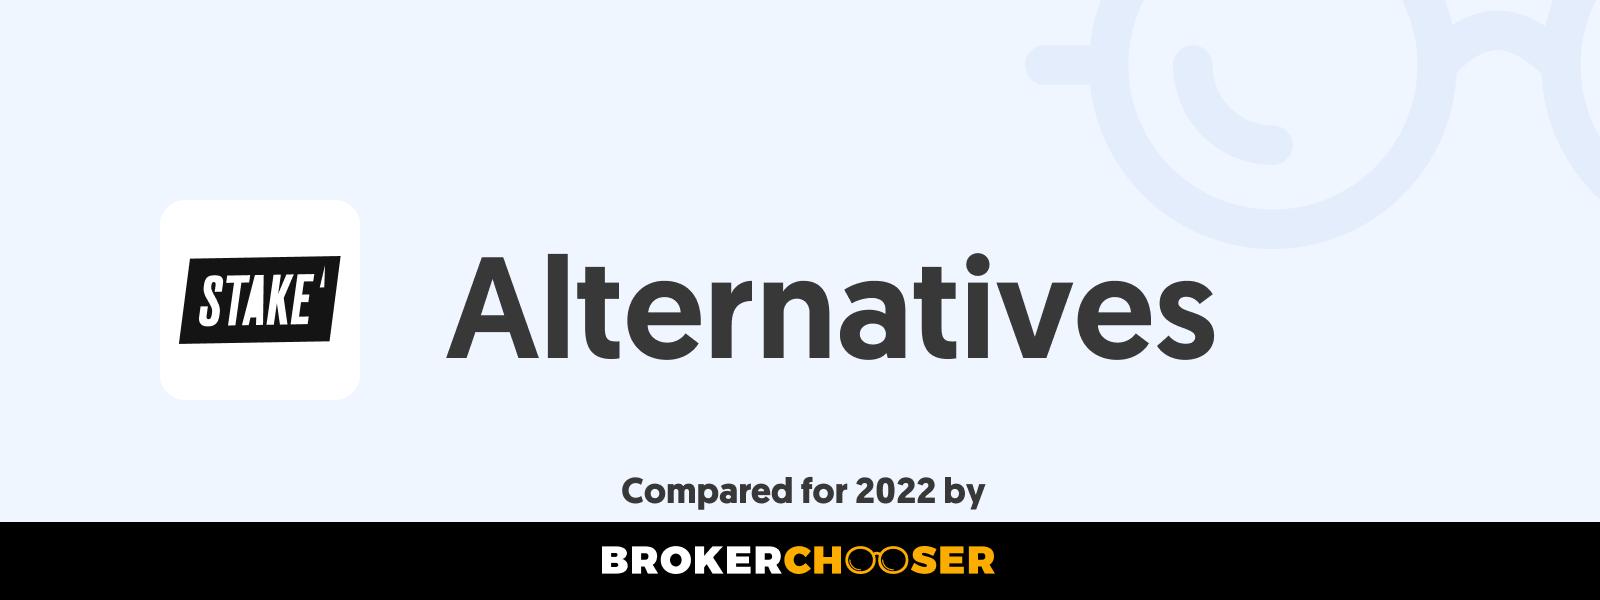 Stake Alternatives